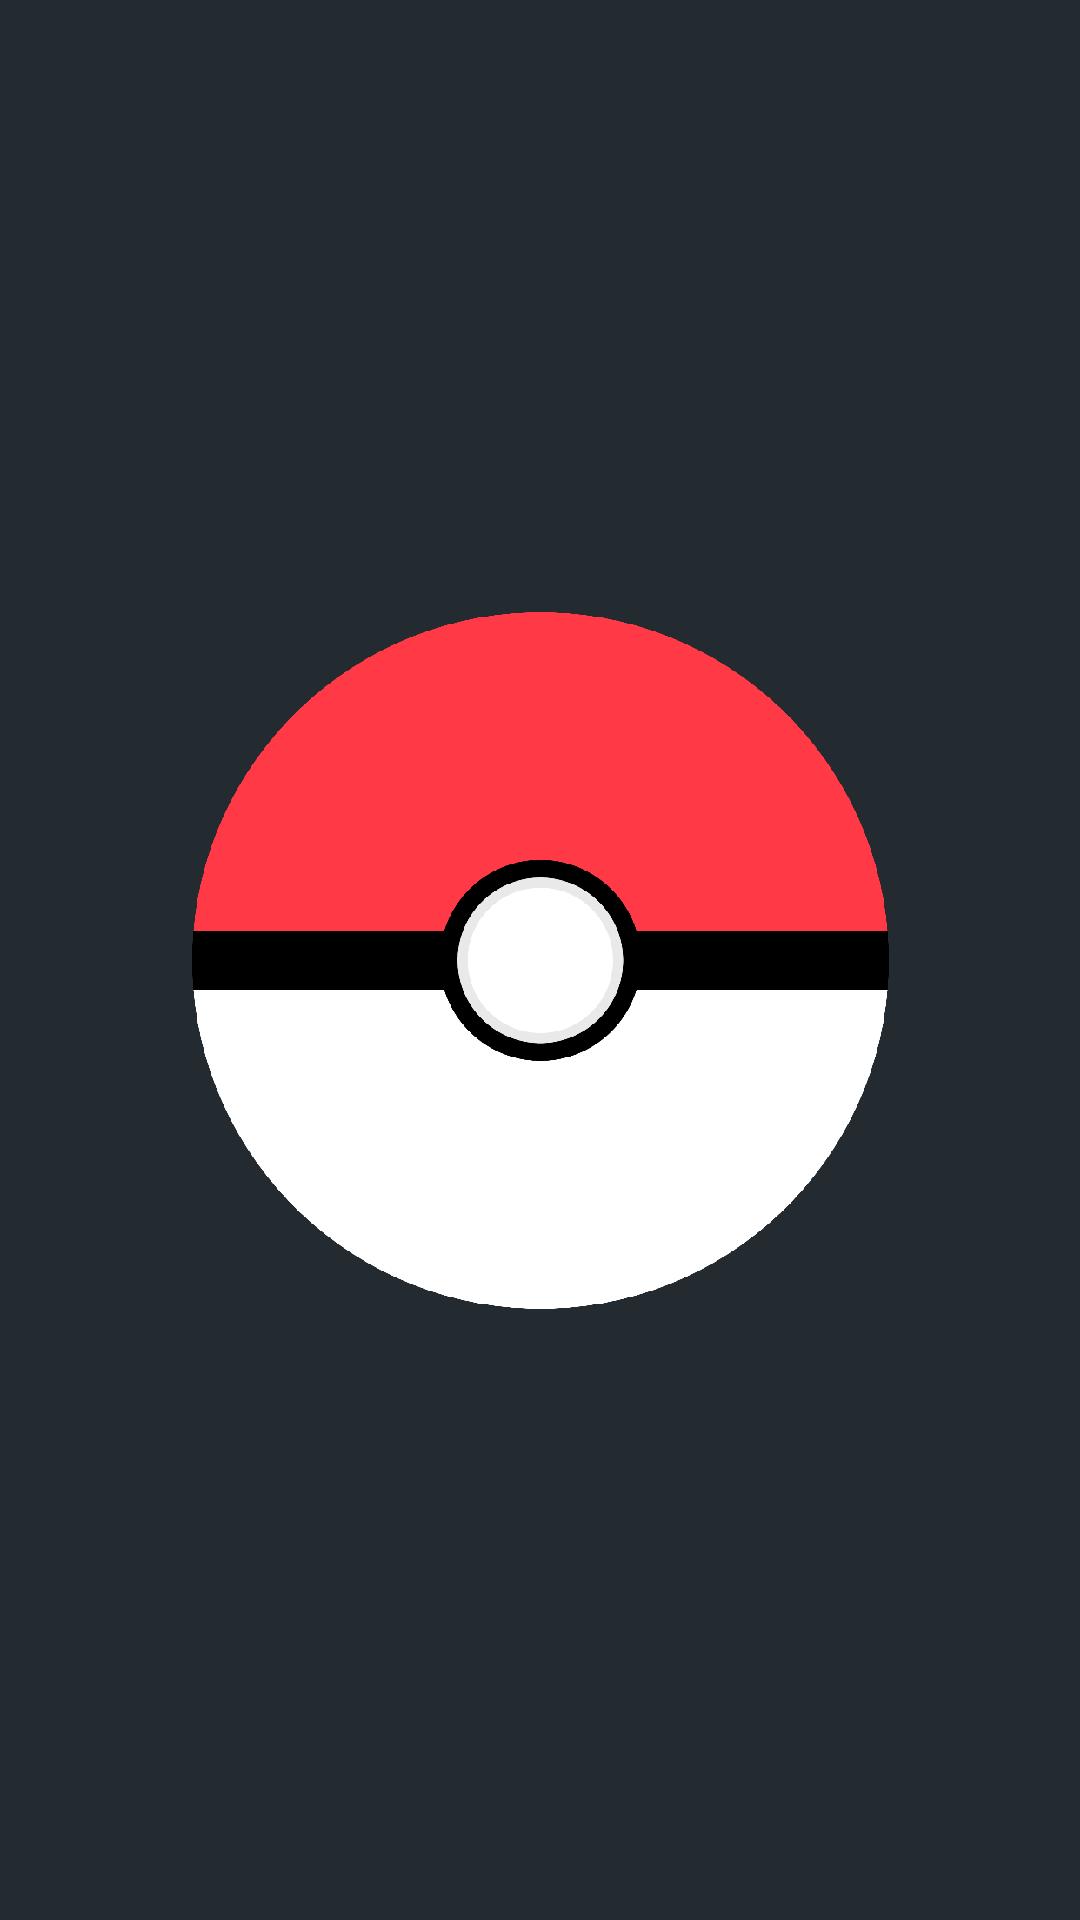 Pokemon Iphone Wallpapers Top Free Pokemon Iphone